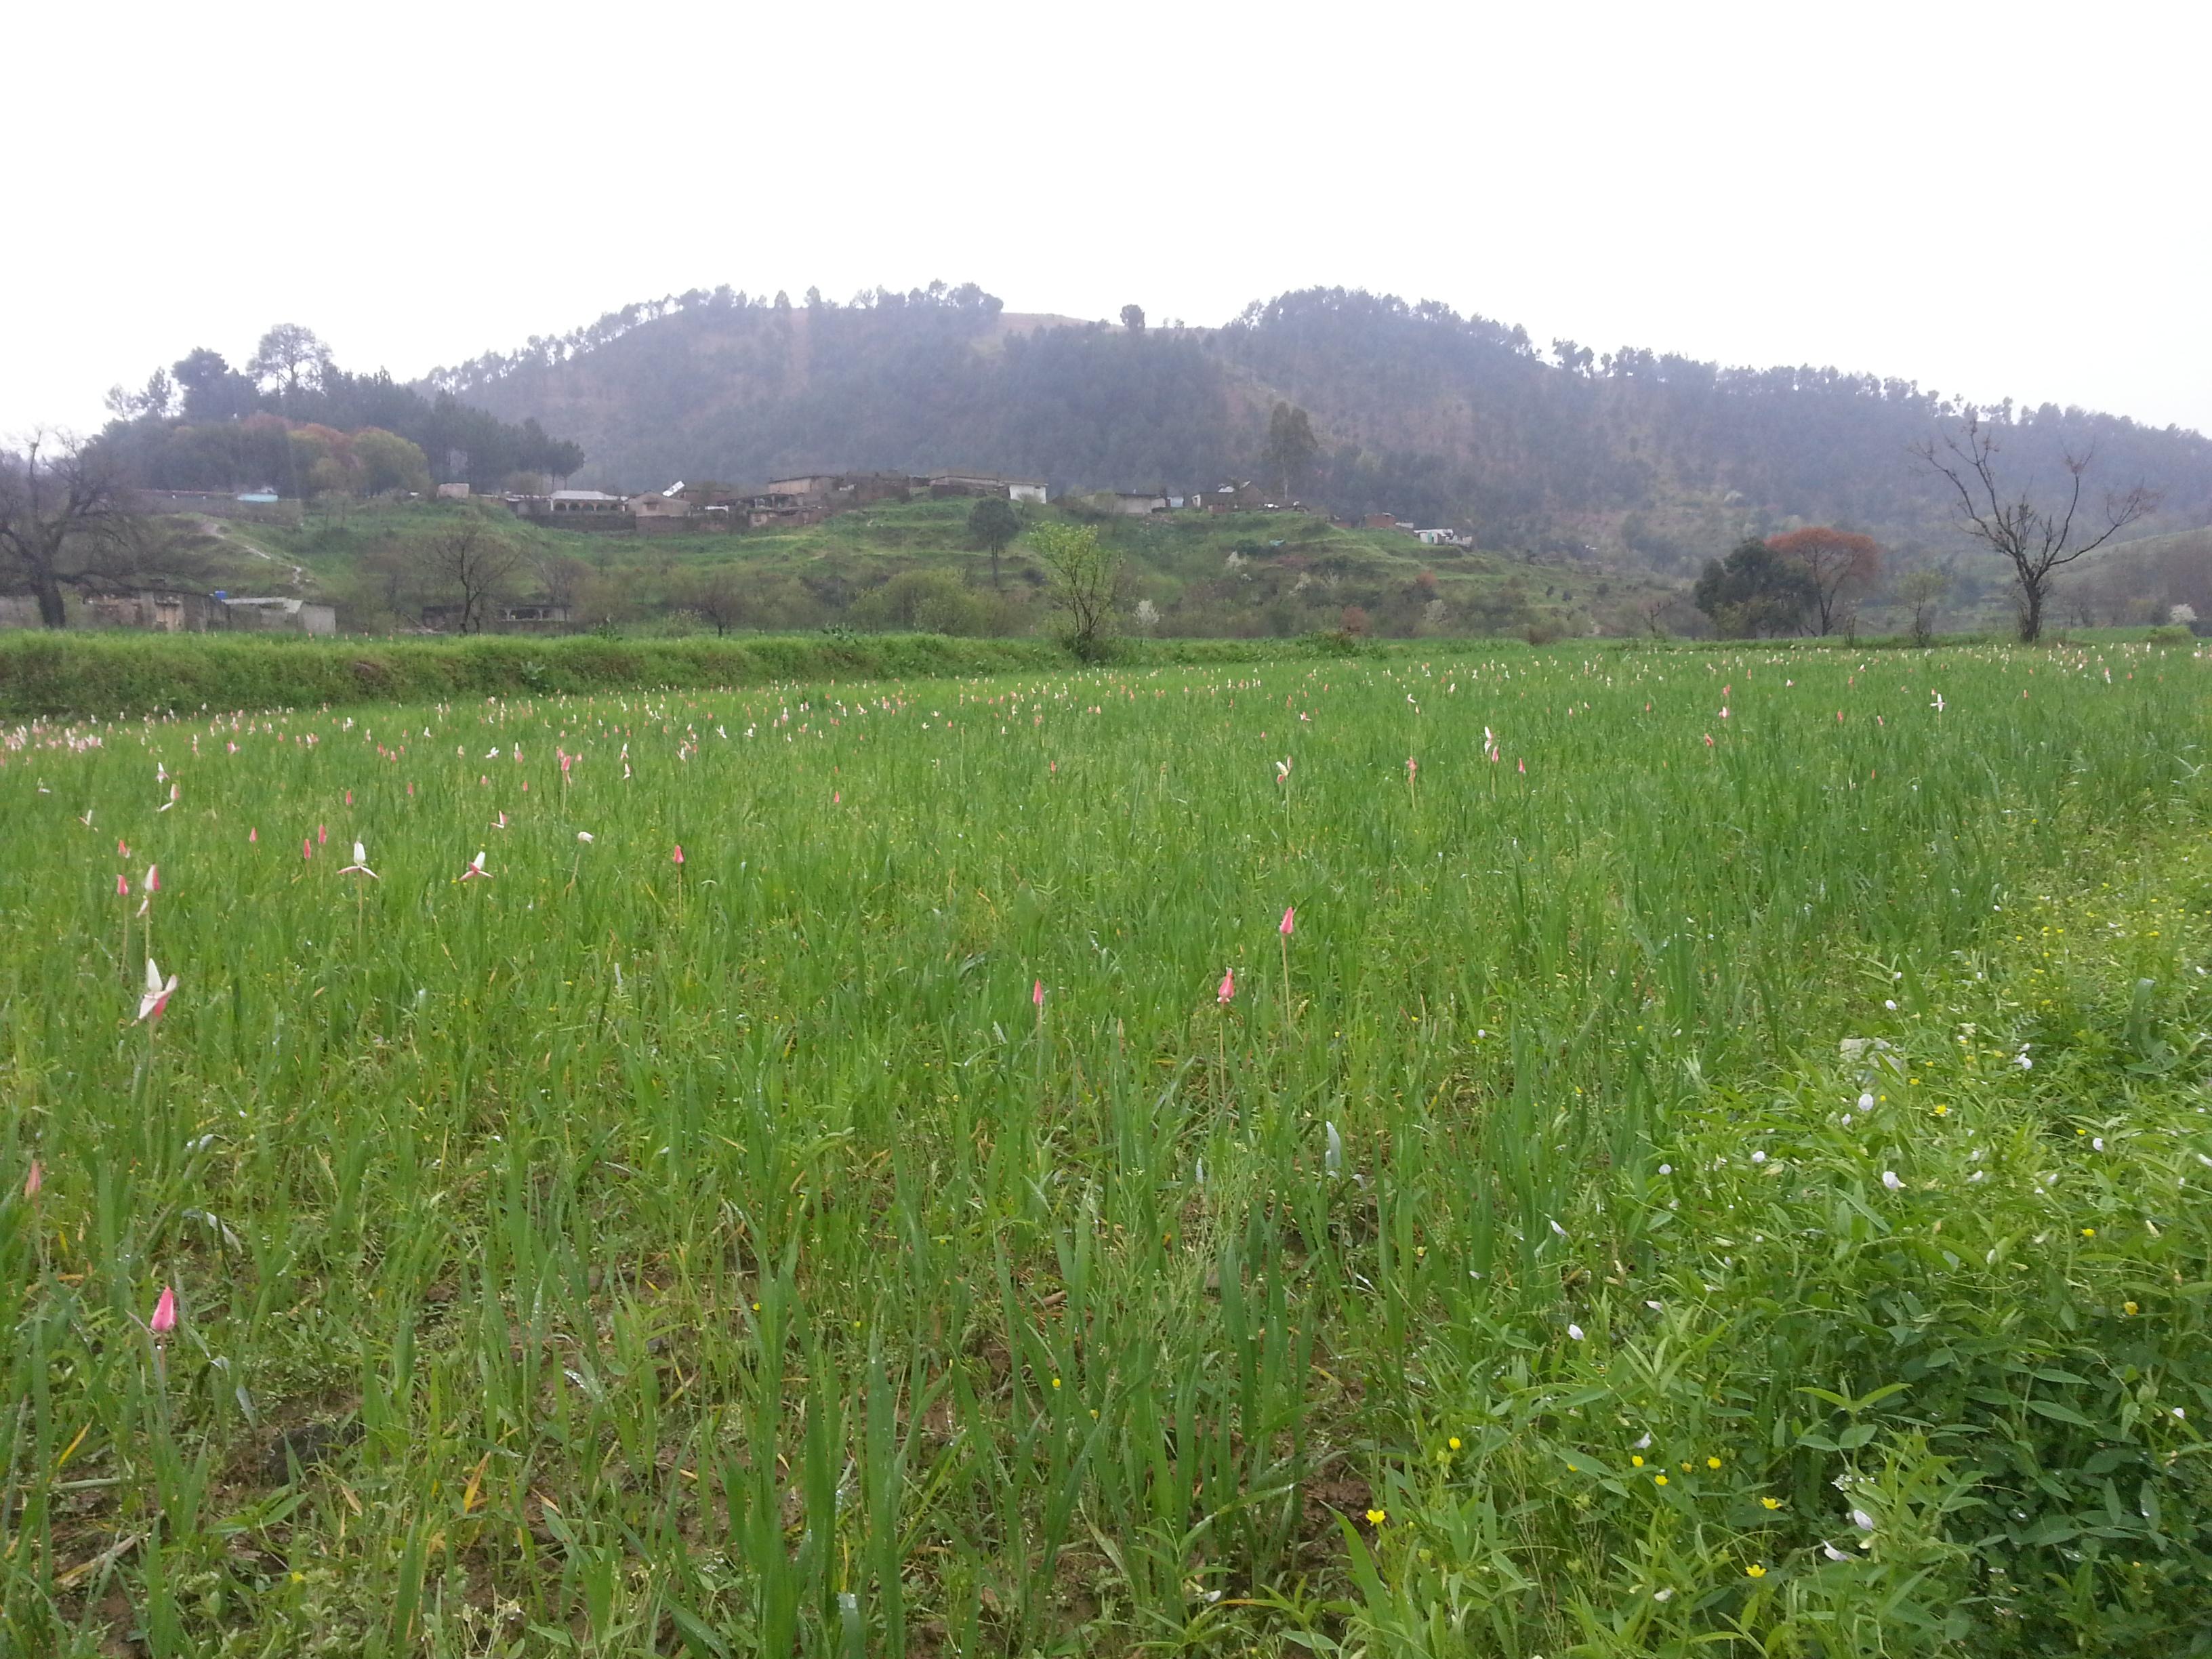 Wheat field with Ghanttol flowers